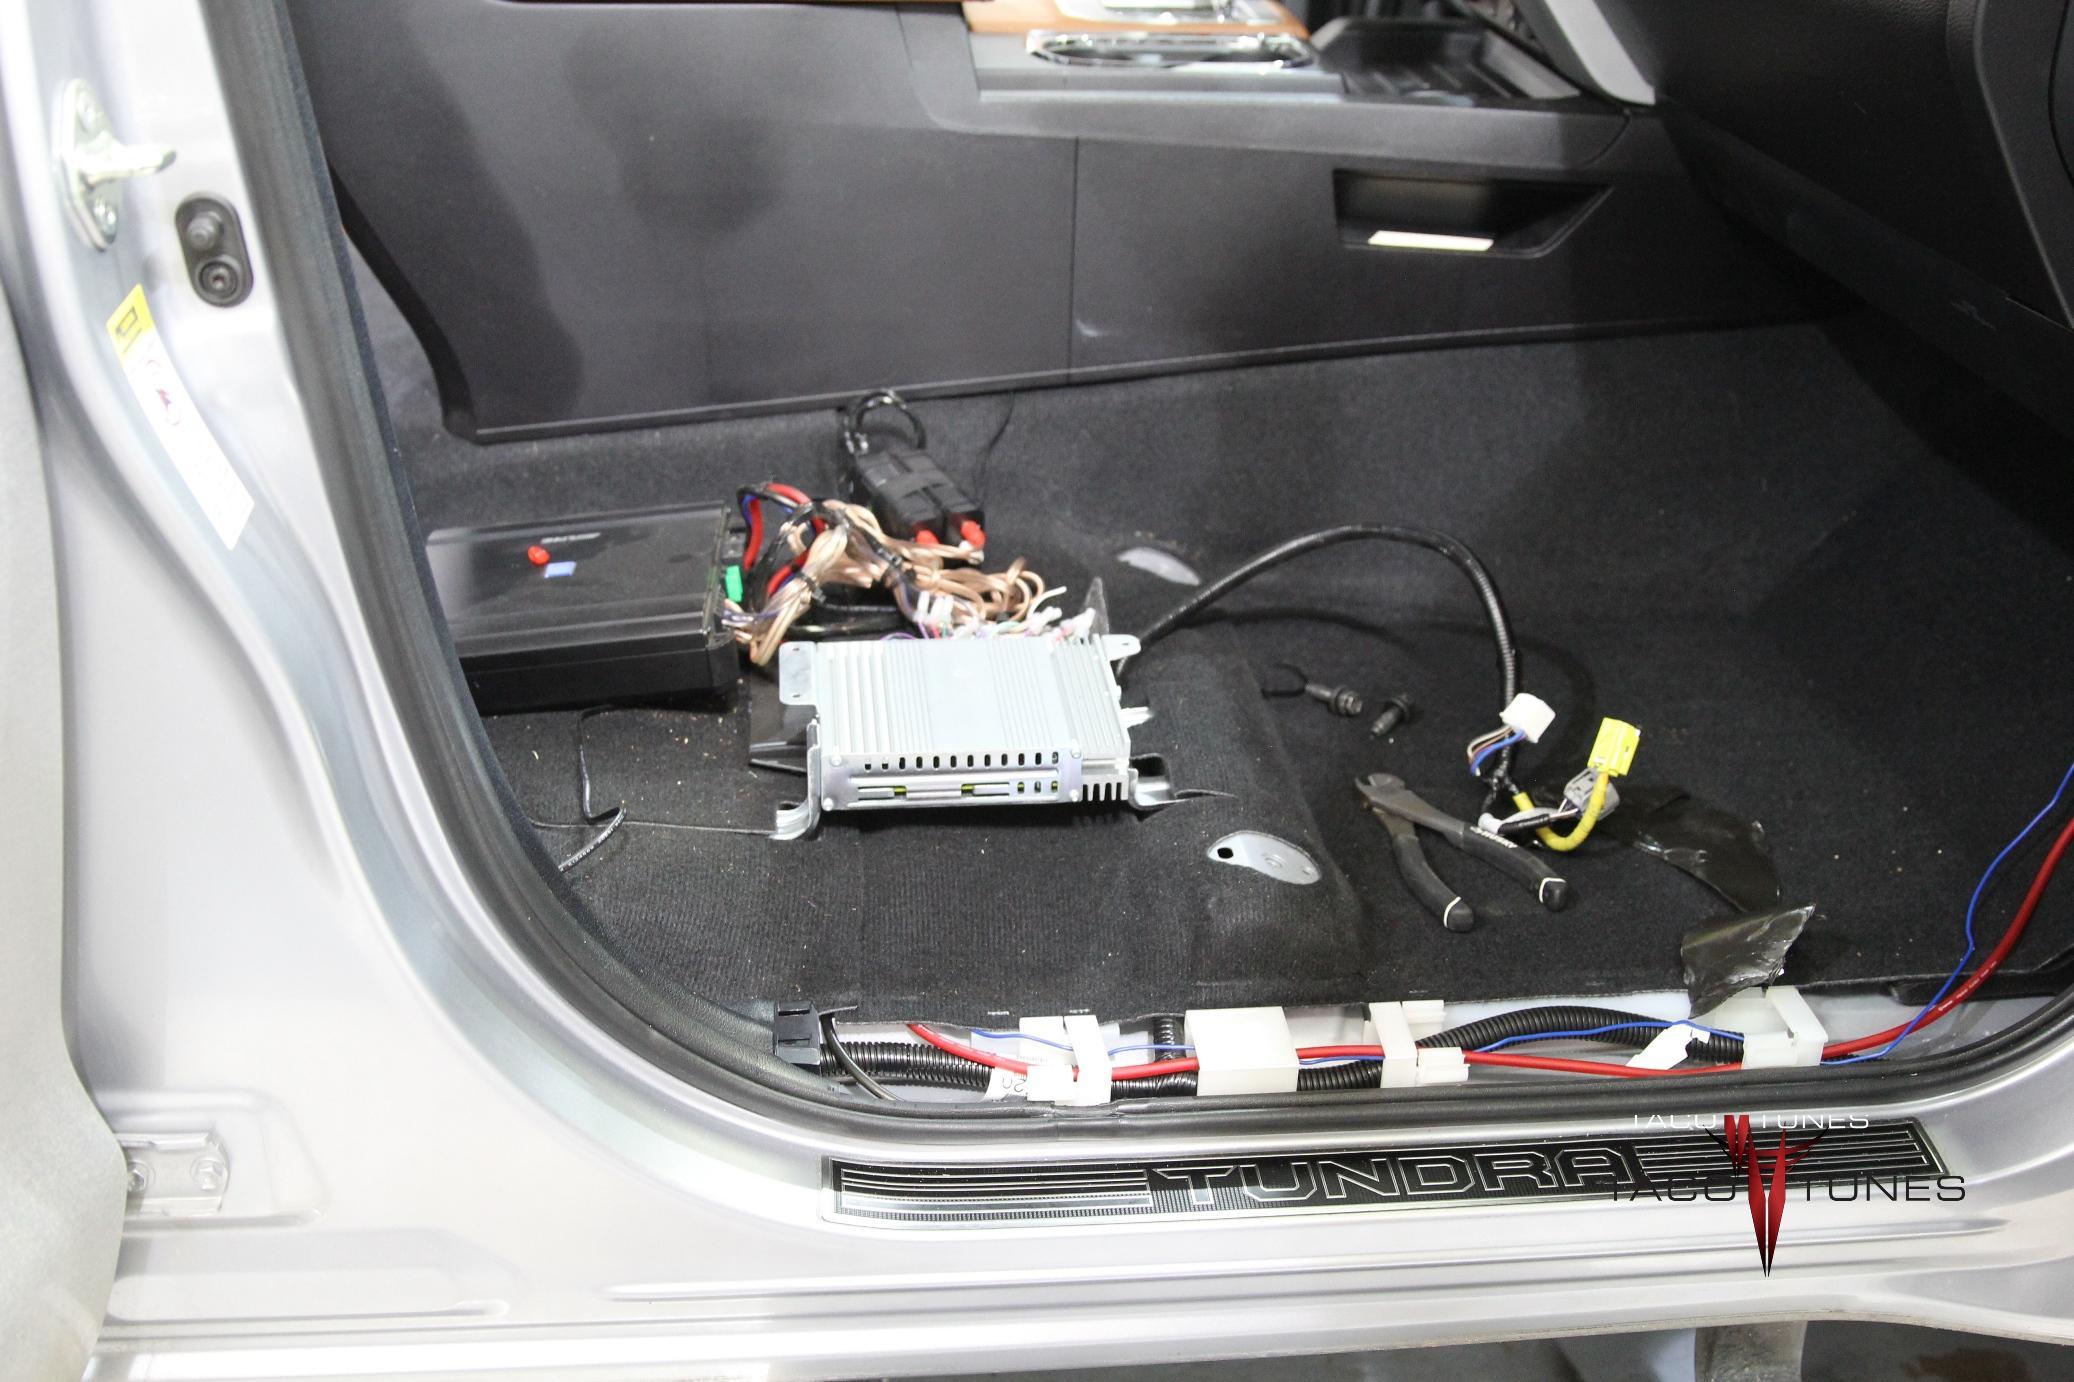 Toyota Tundra Jbl Wiring Harness - Wiring Liry on 2014 tundra radio wiring, tundra stereo wiring diagram, tundra wiring schematic,